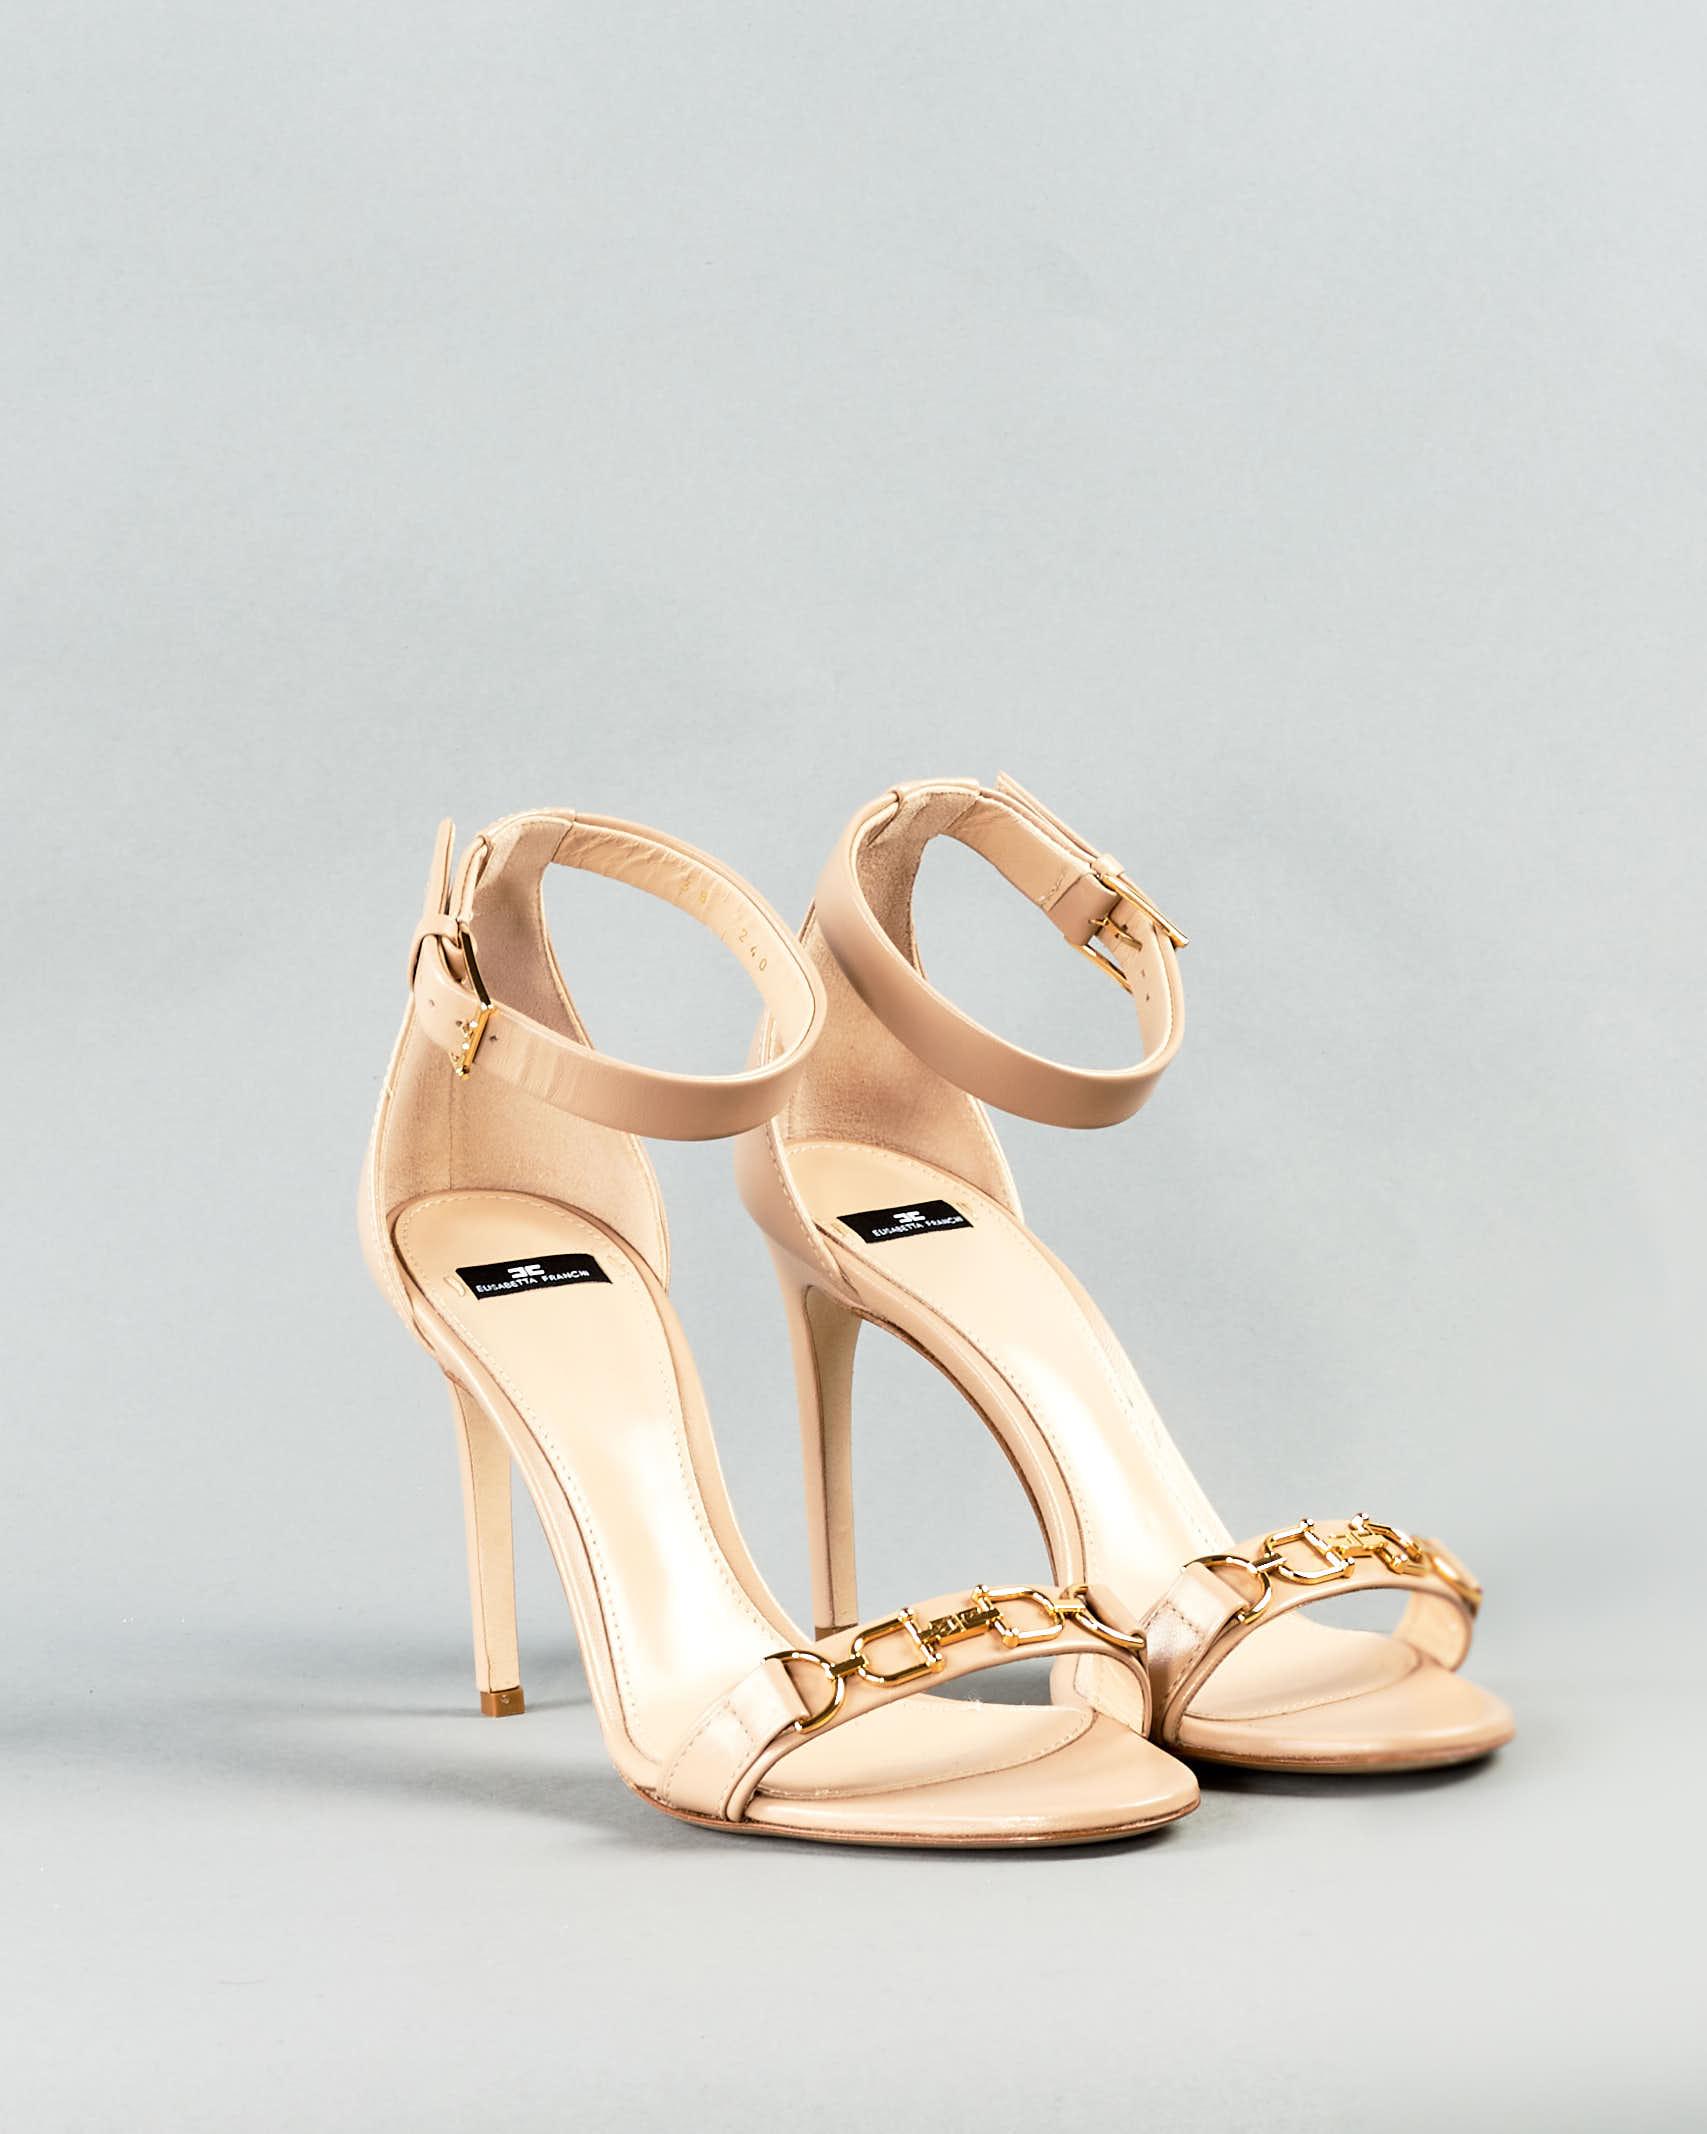 Sandalo con logo Elisabetta Franchi ELISABETTA FRANCHI | Sandali | SA97L11E2470